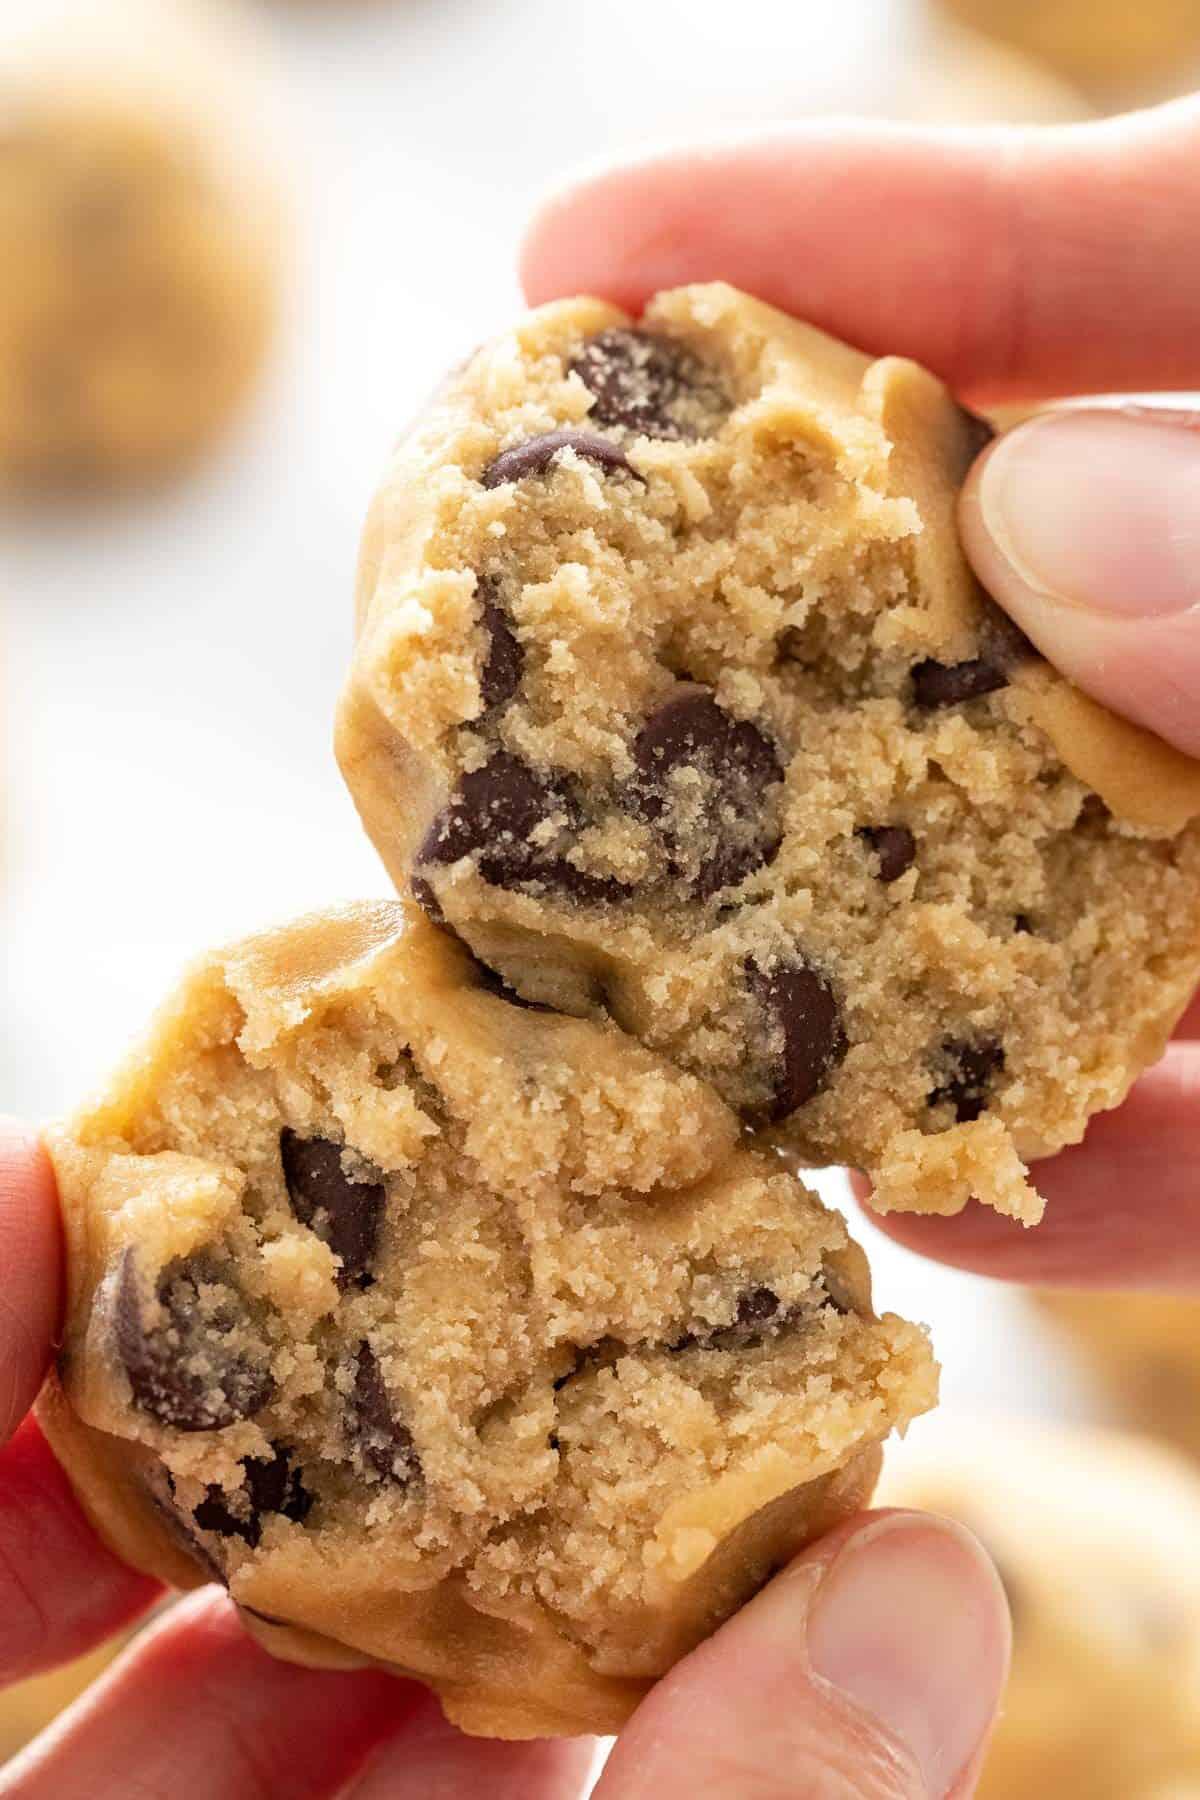 Tearing apart a cookie dough ball